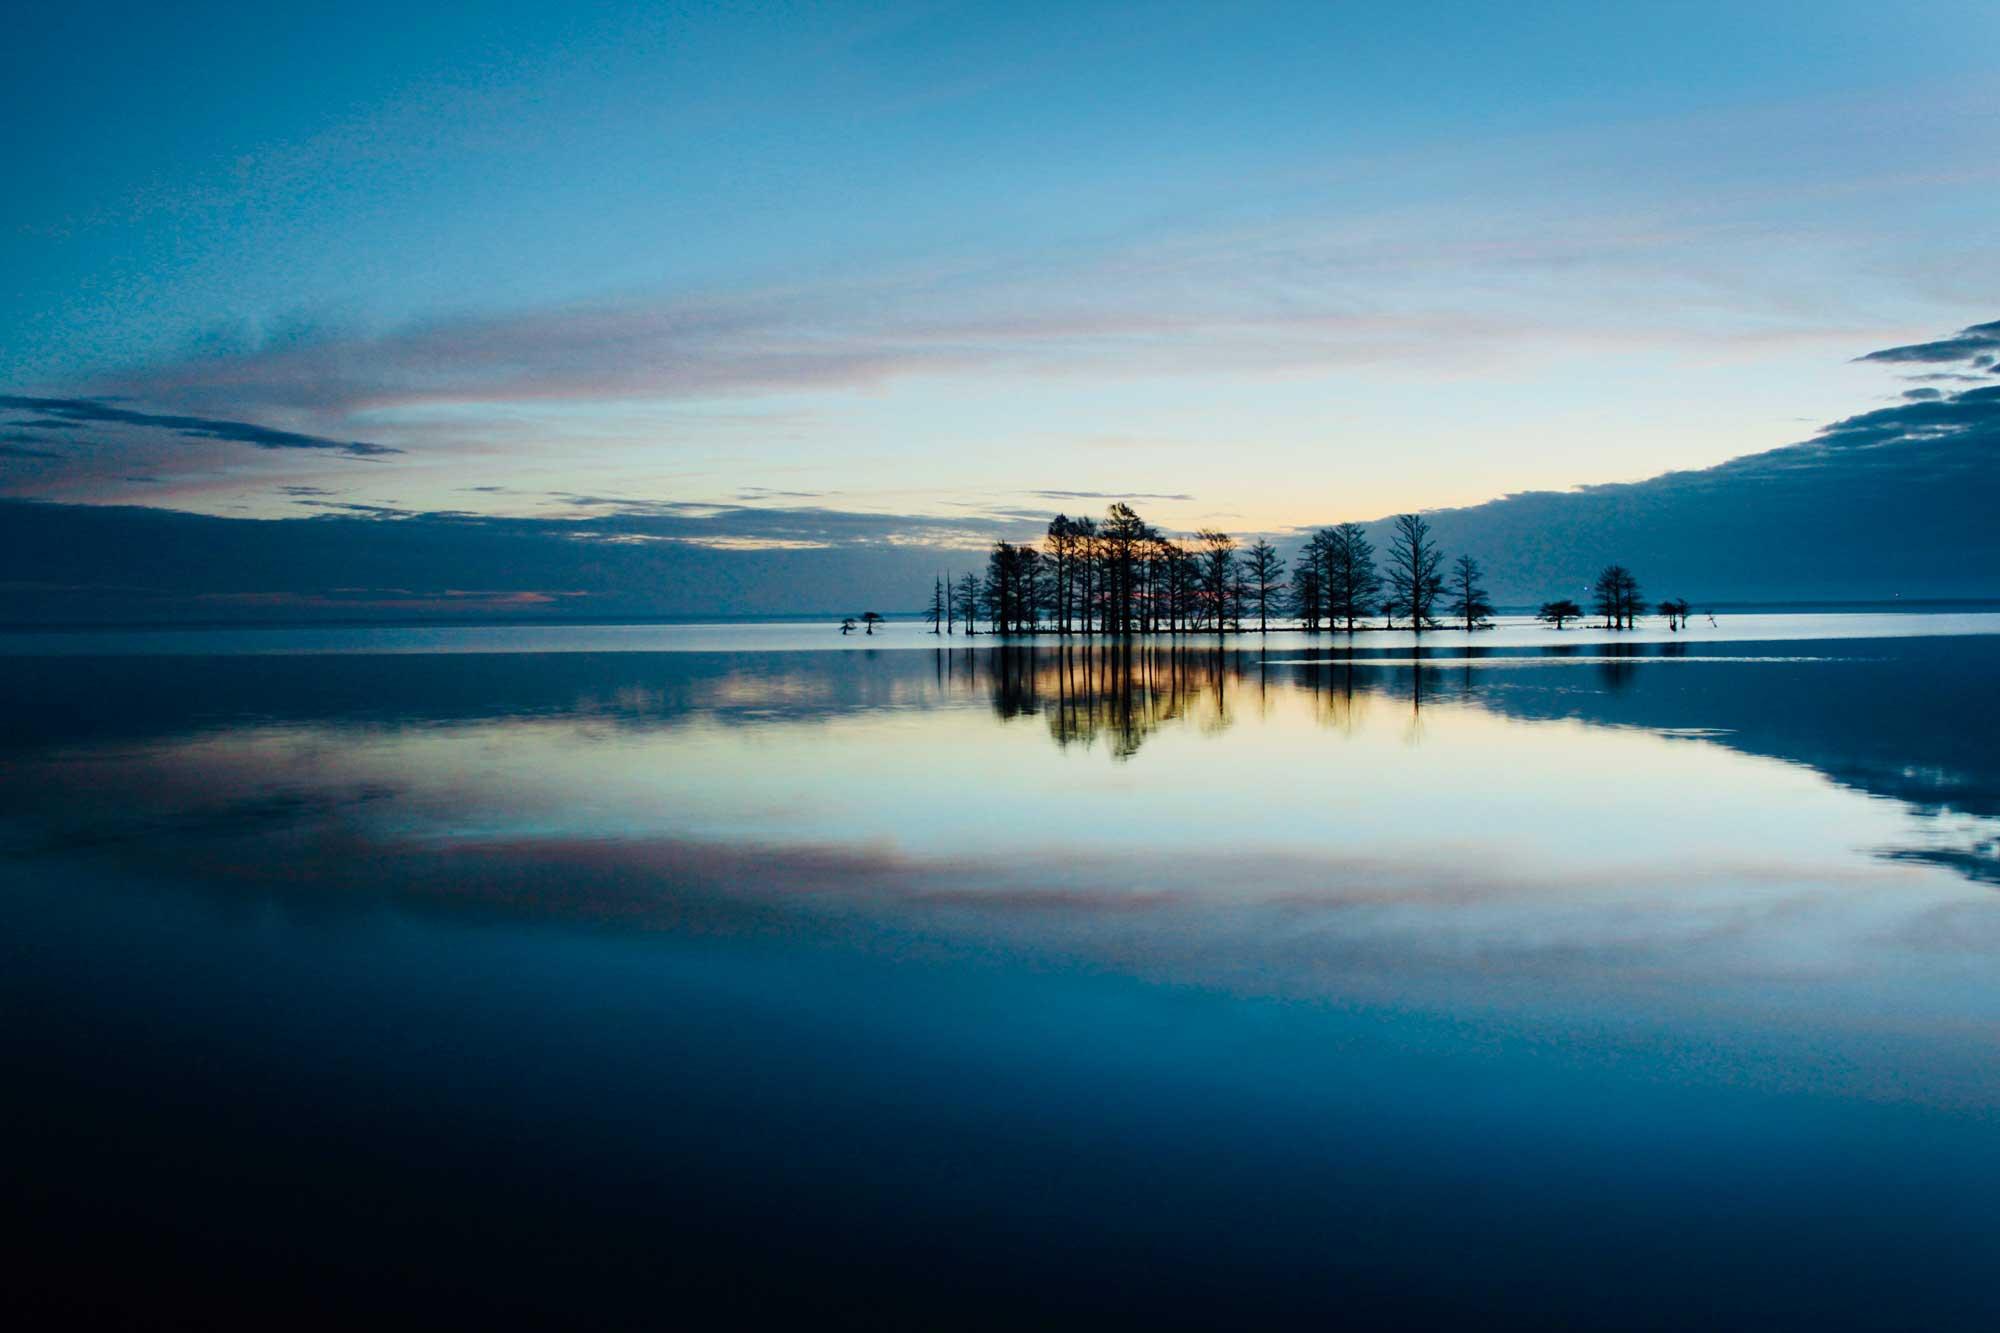 Sunrise on Lake Mattamuskeet, North Carolina